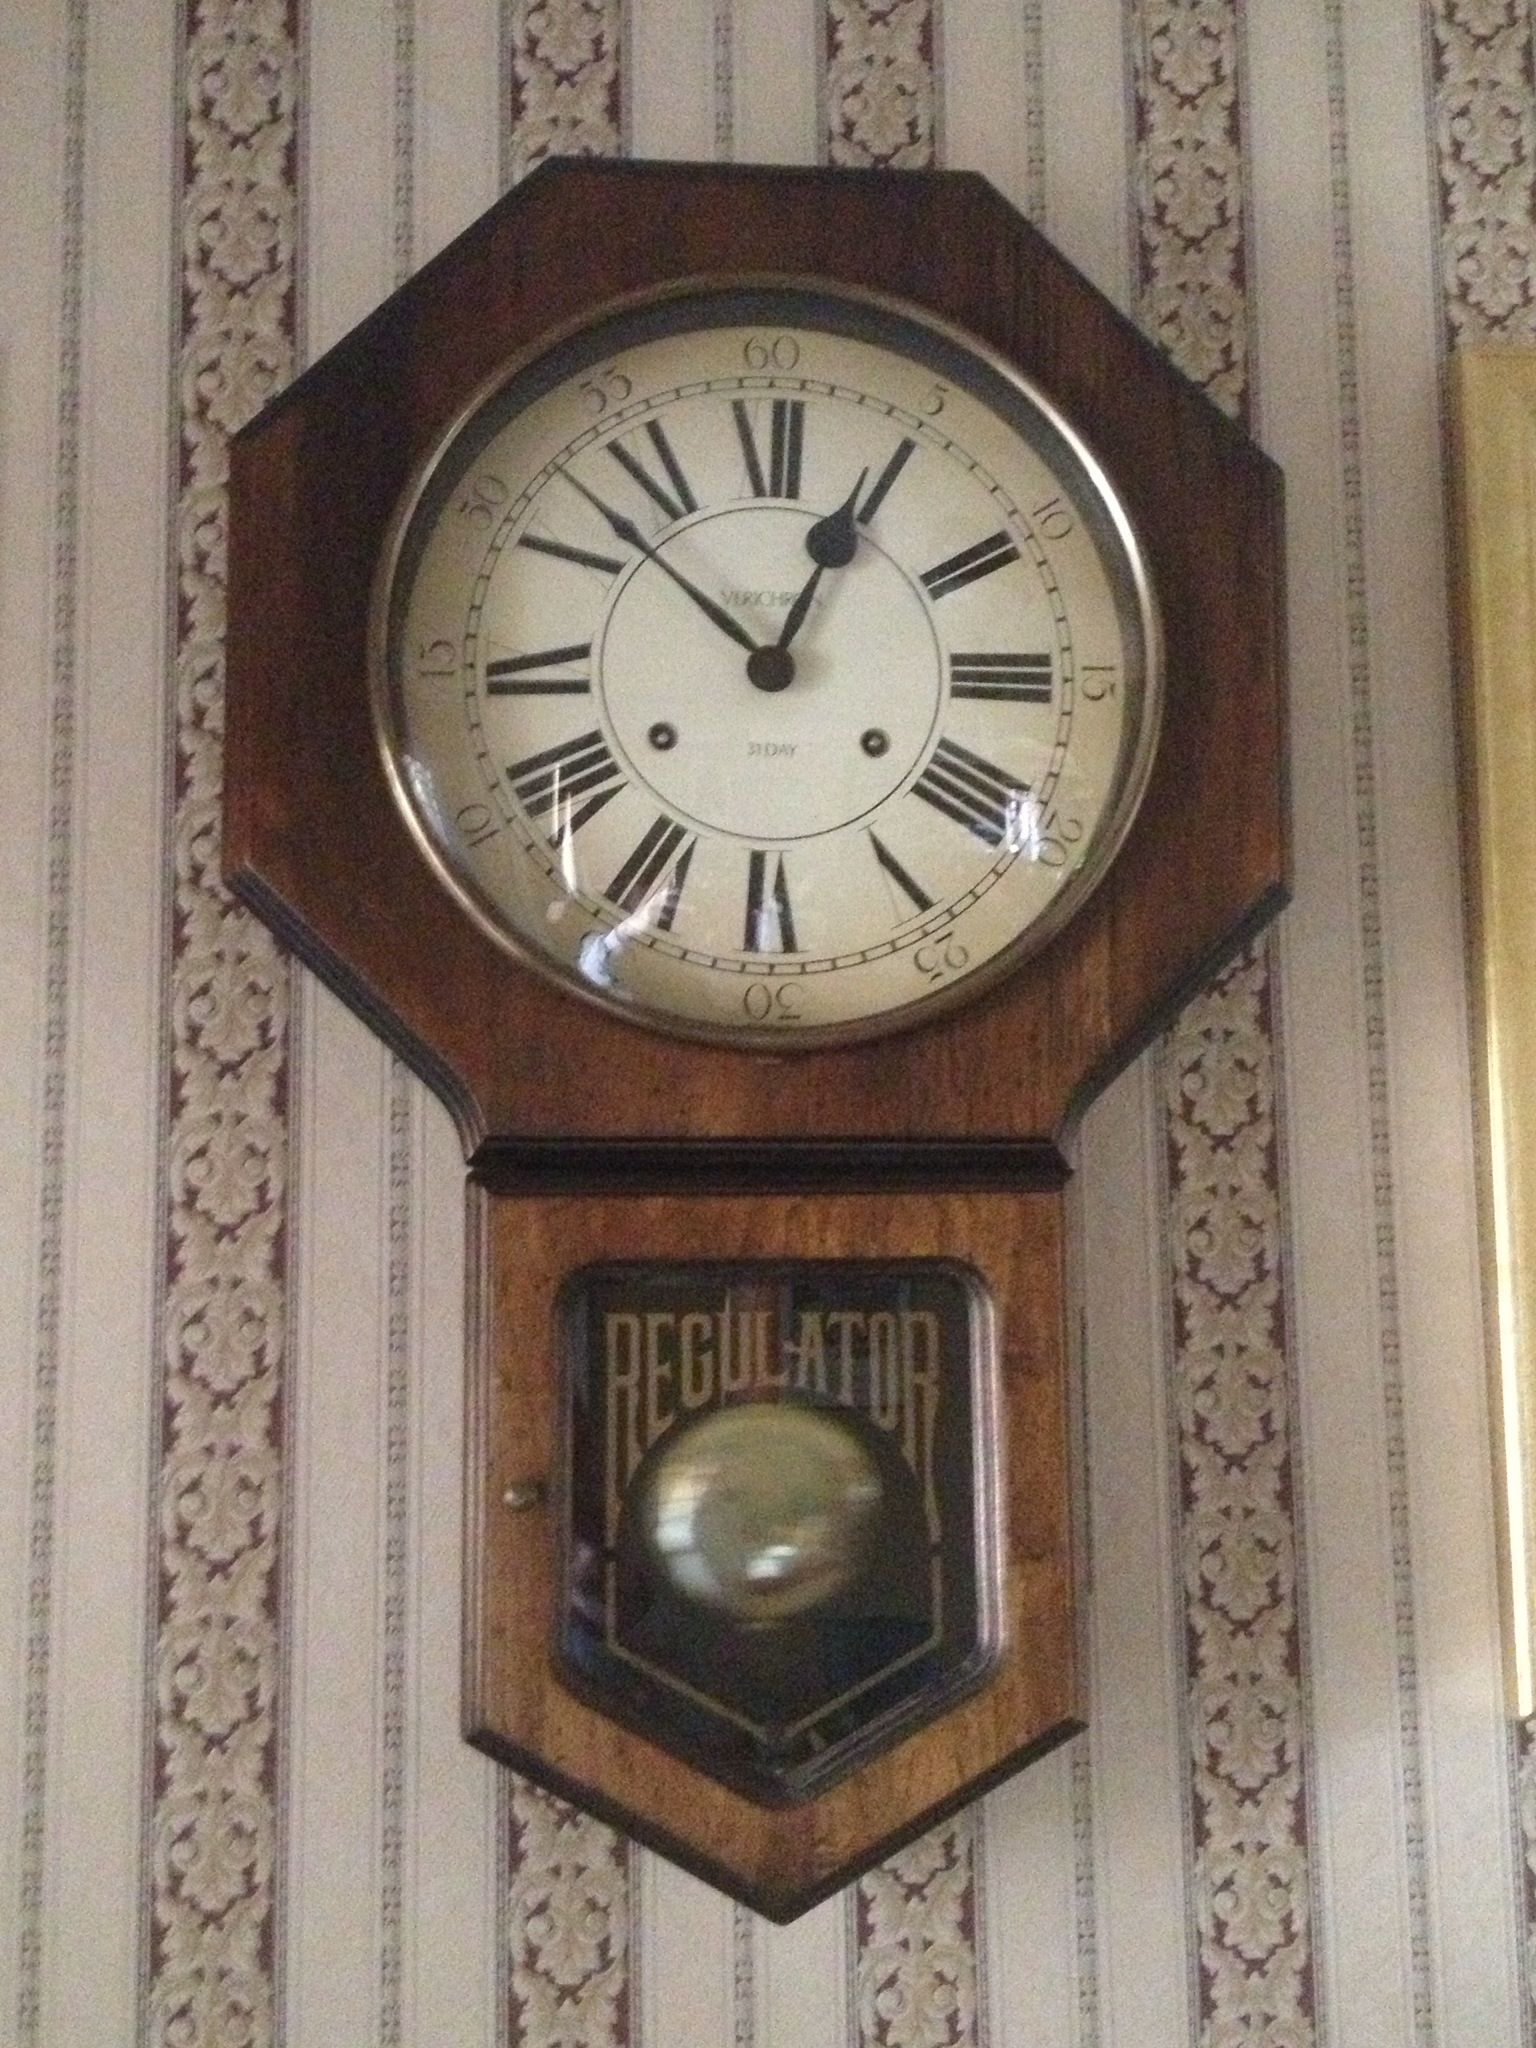 Newer clock midcentury Verichron Regulator Schoolhouse clock